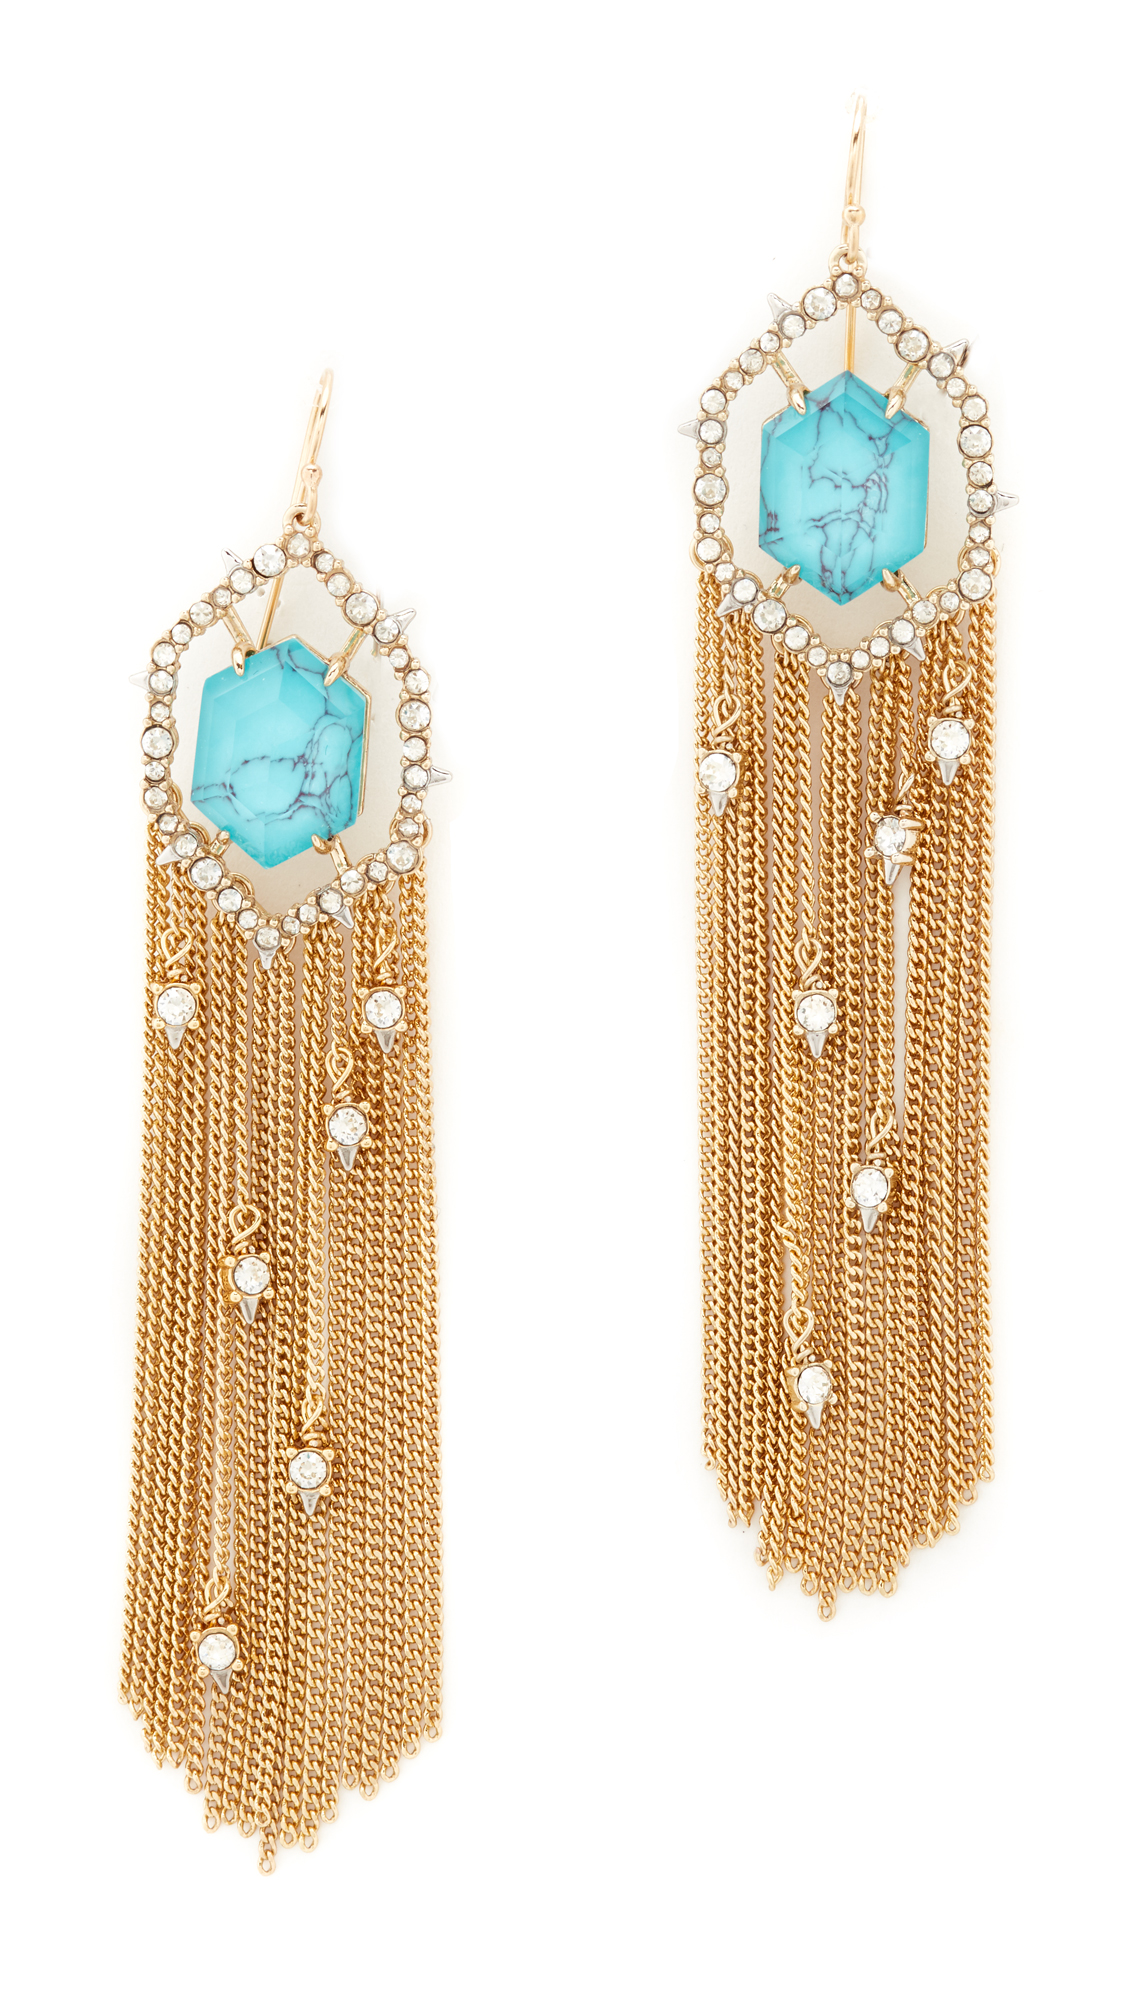 Alexis Bittar Crystal Framed Tassel Earrings - Gold/Rhodium